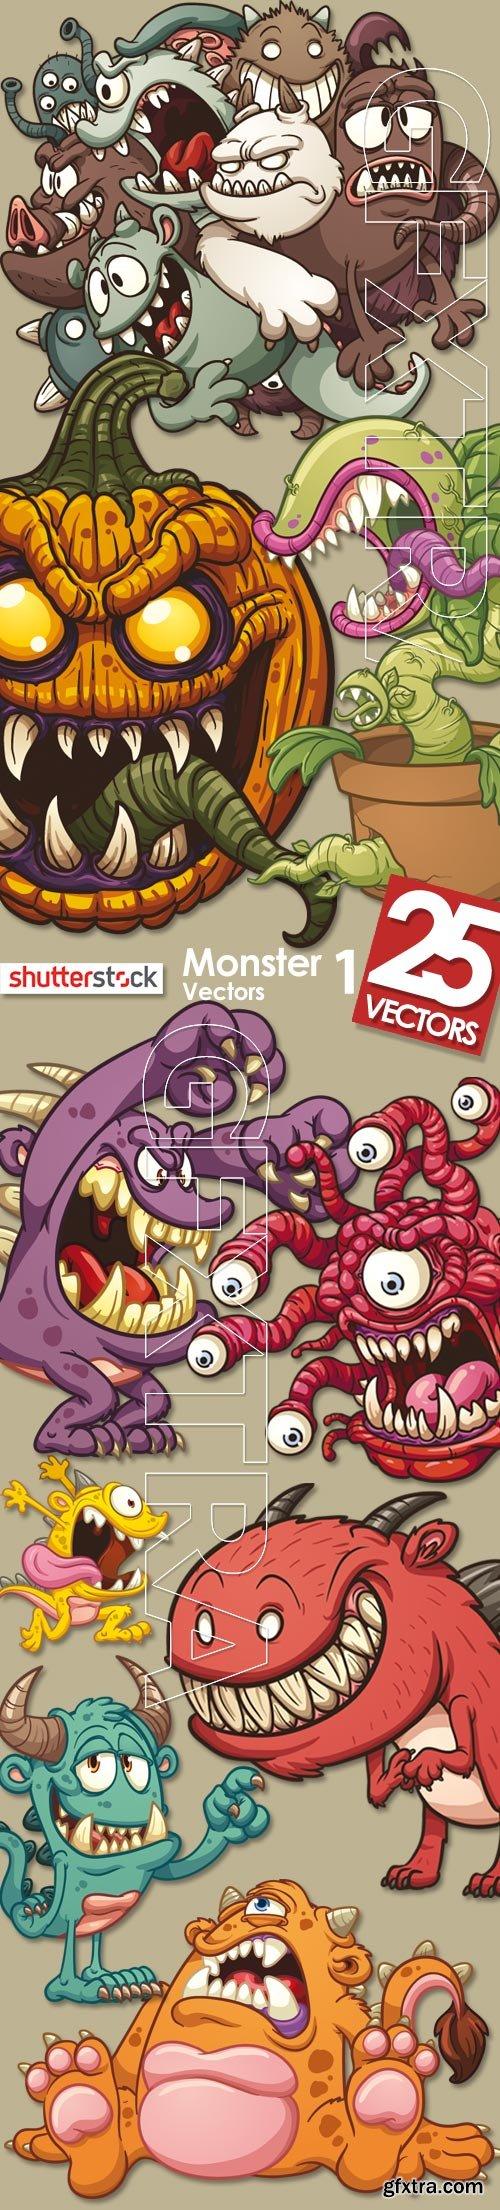 Monster Vectors 1, 25xEPS